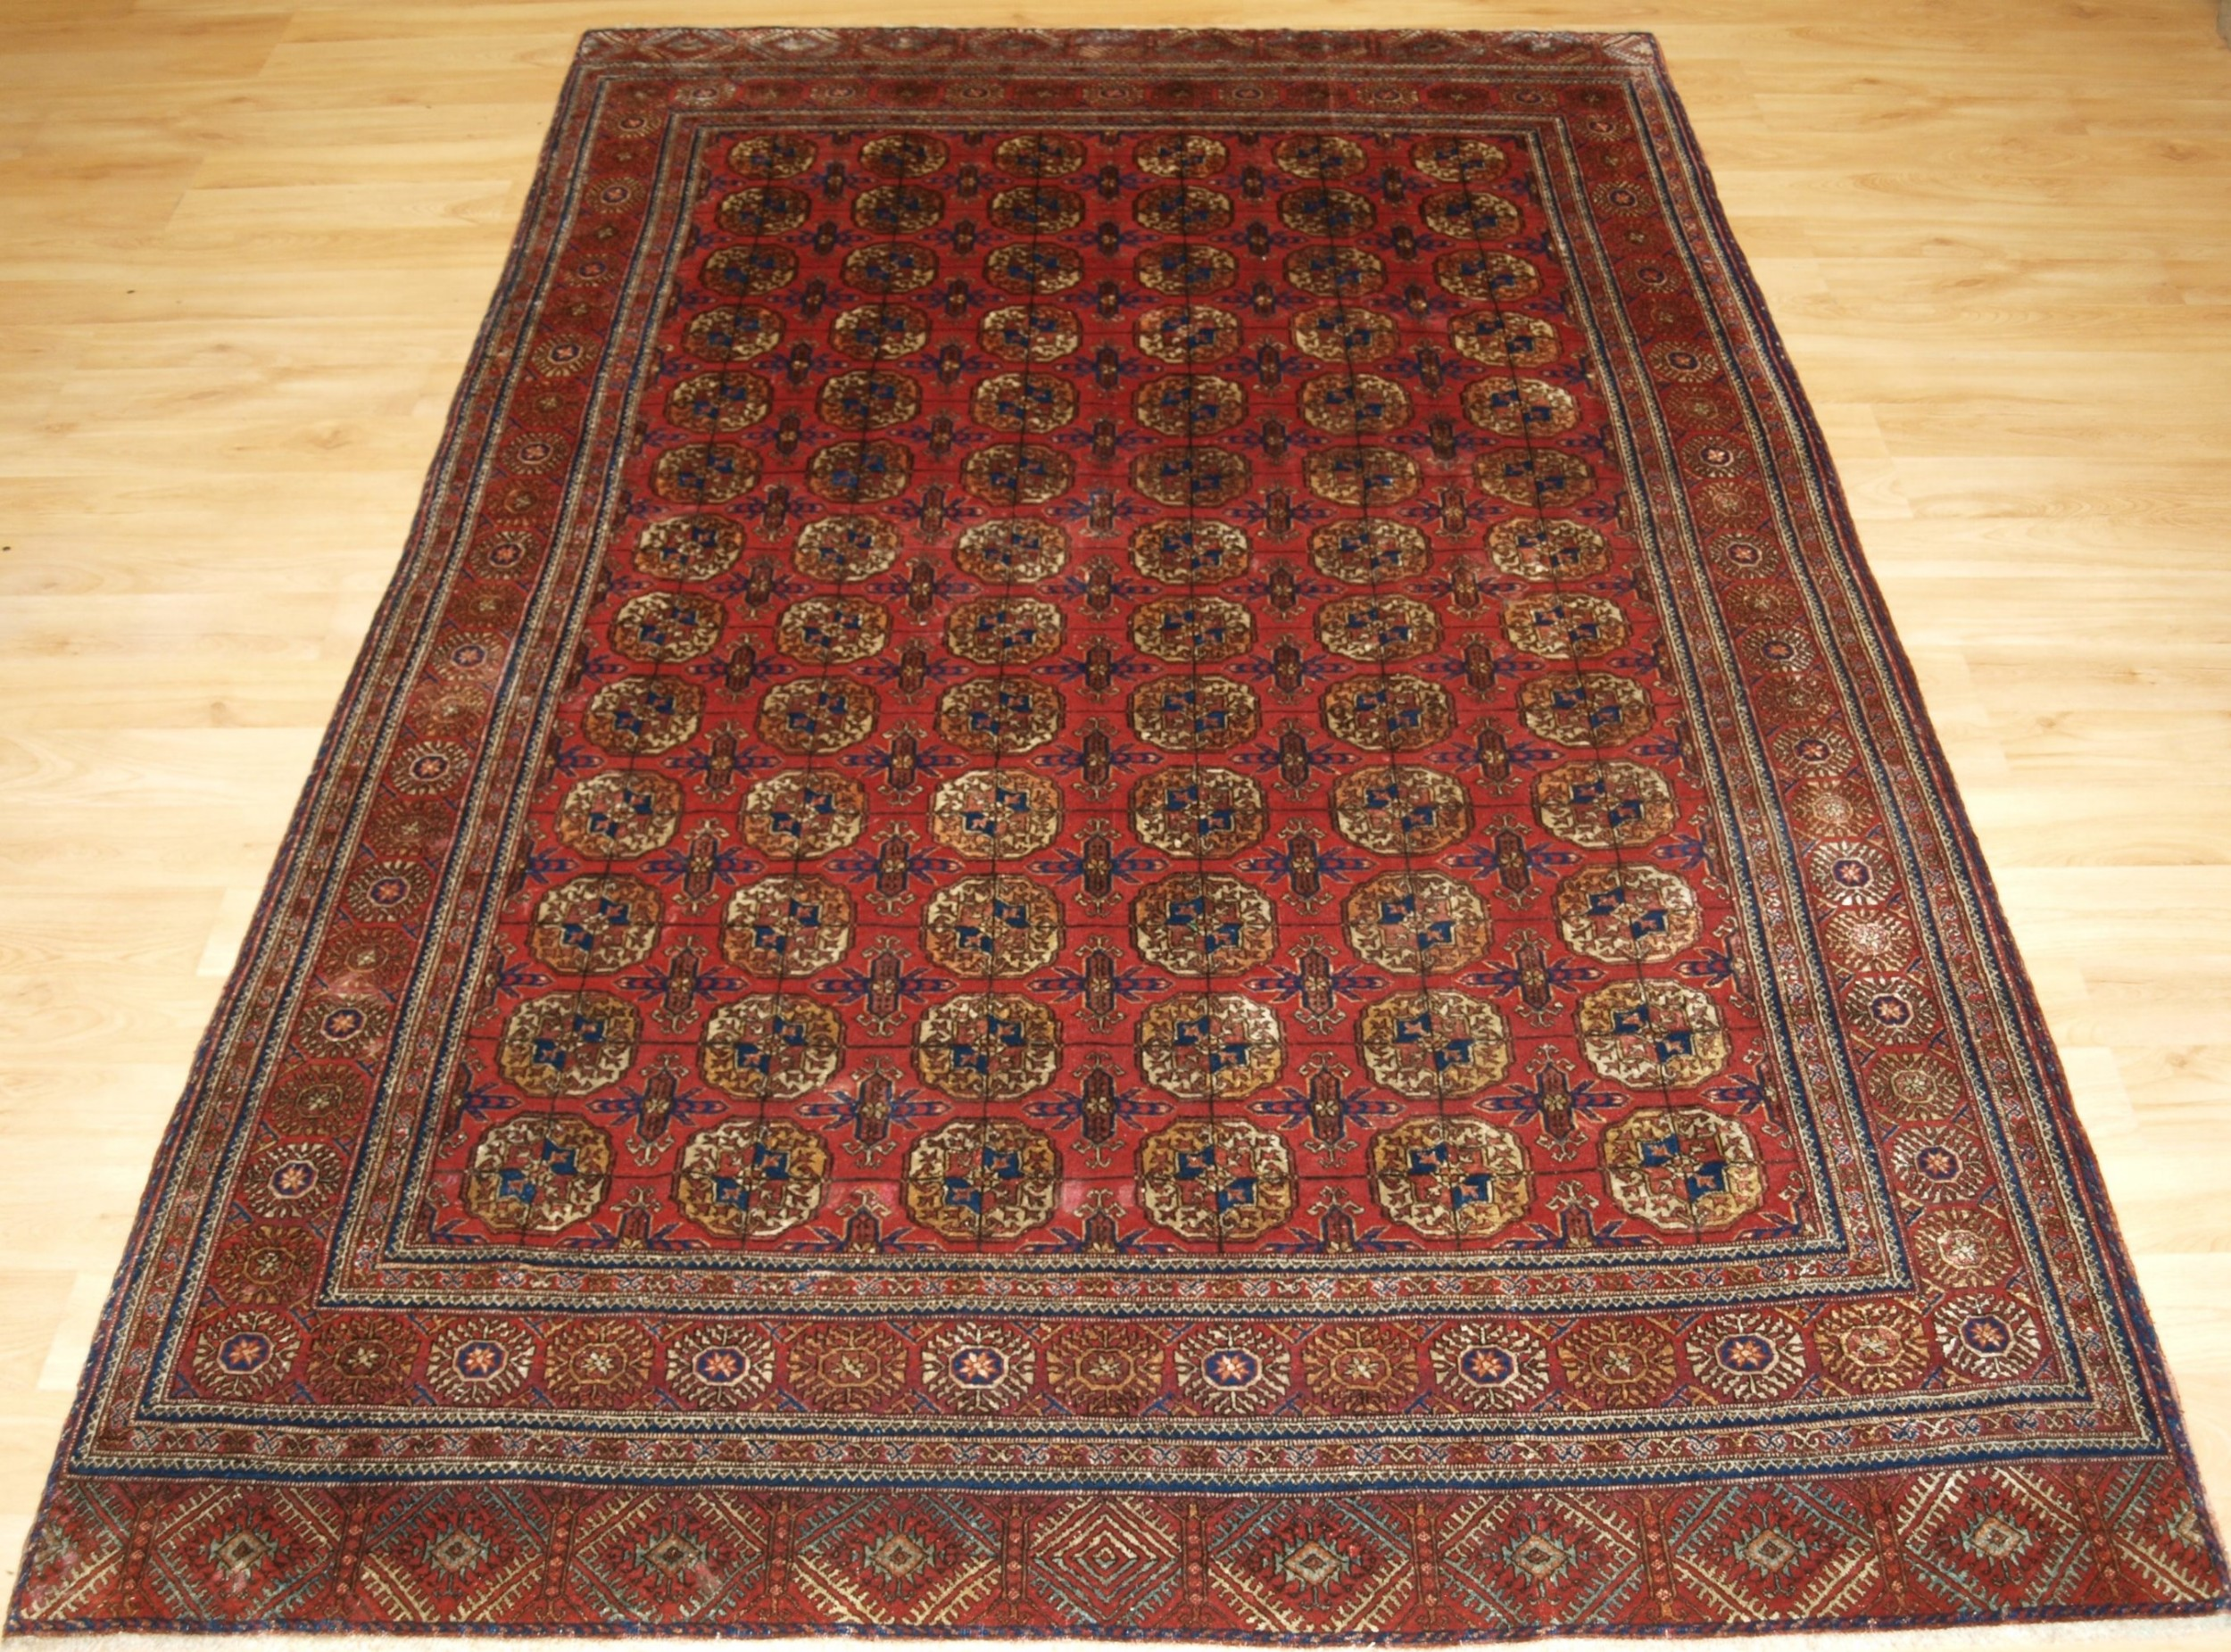 antique tekke turkmen rug very fine with silk highlights circa 1920